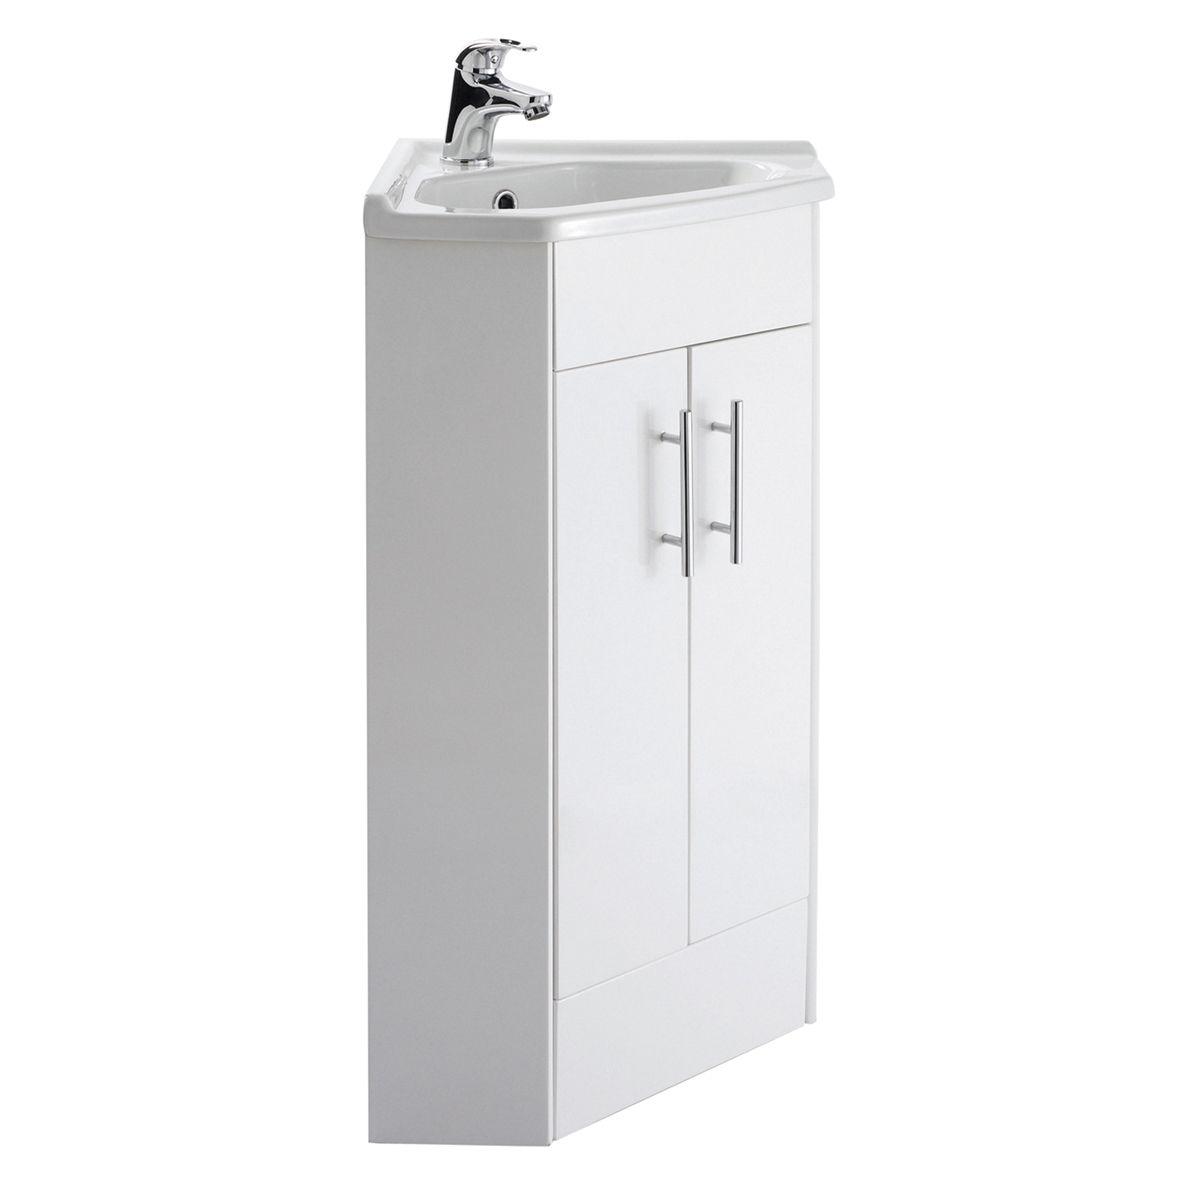 Nuie High Gloss White Double Door Corner Vanity Unit